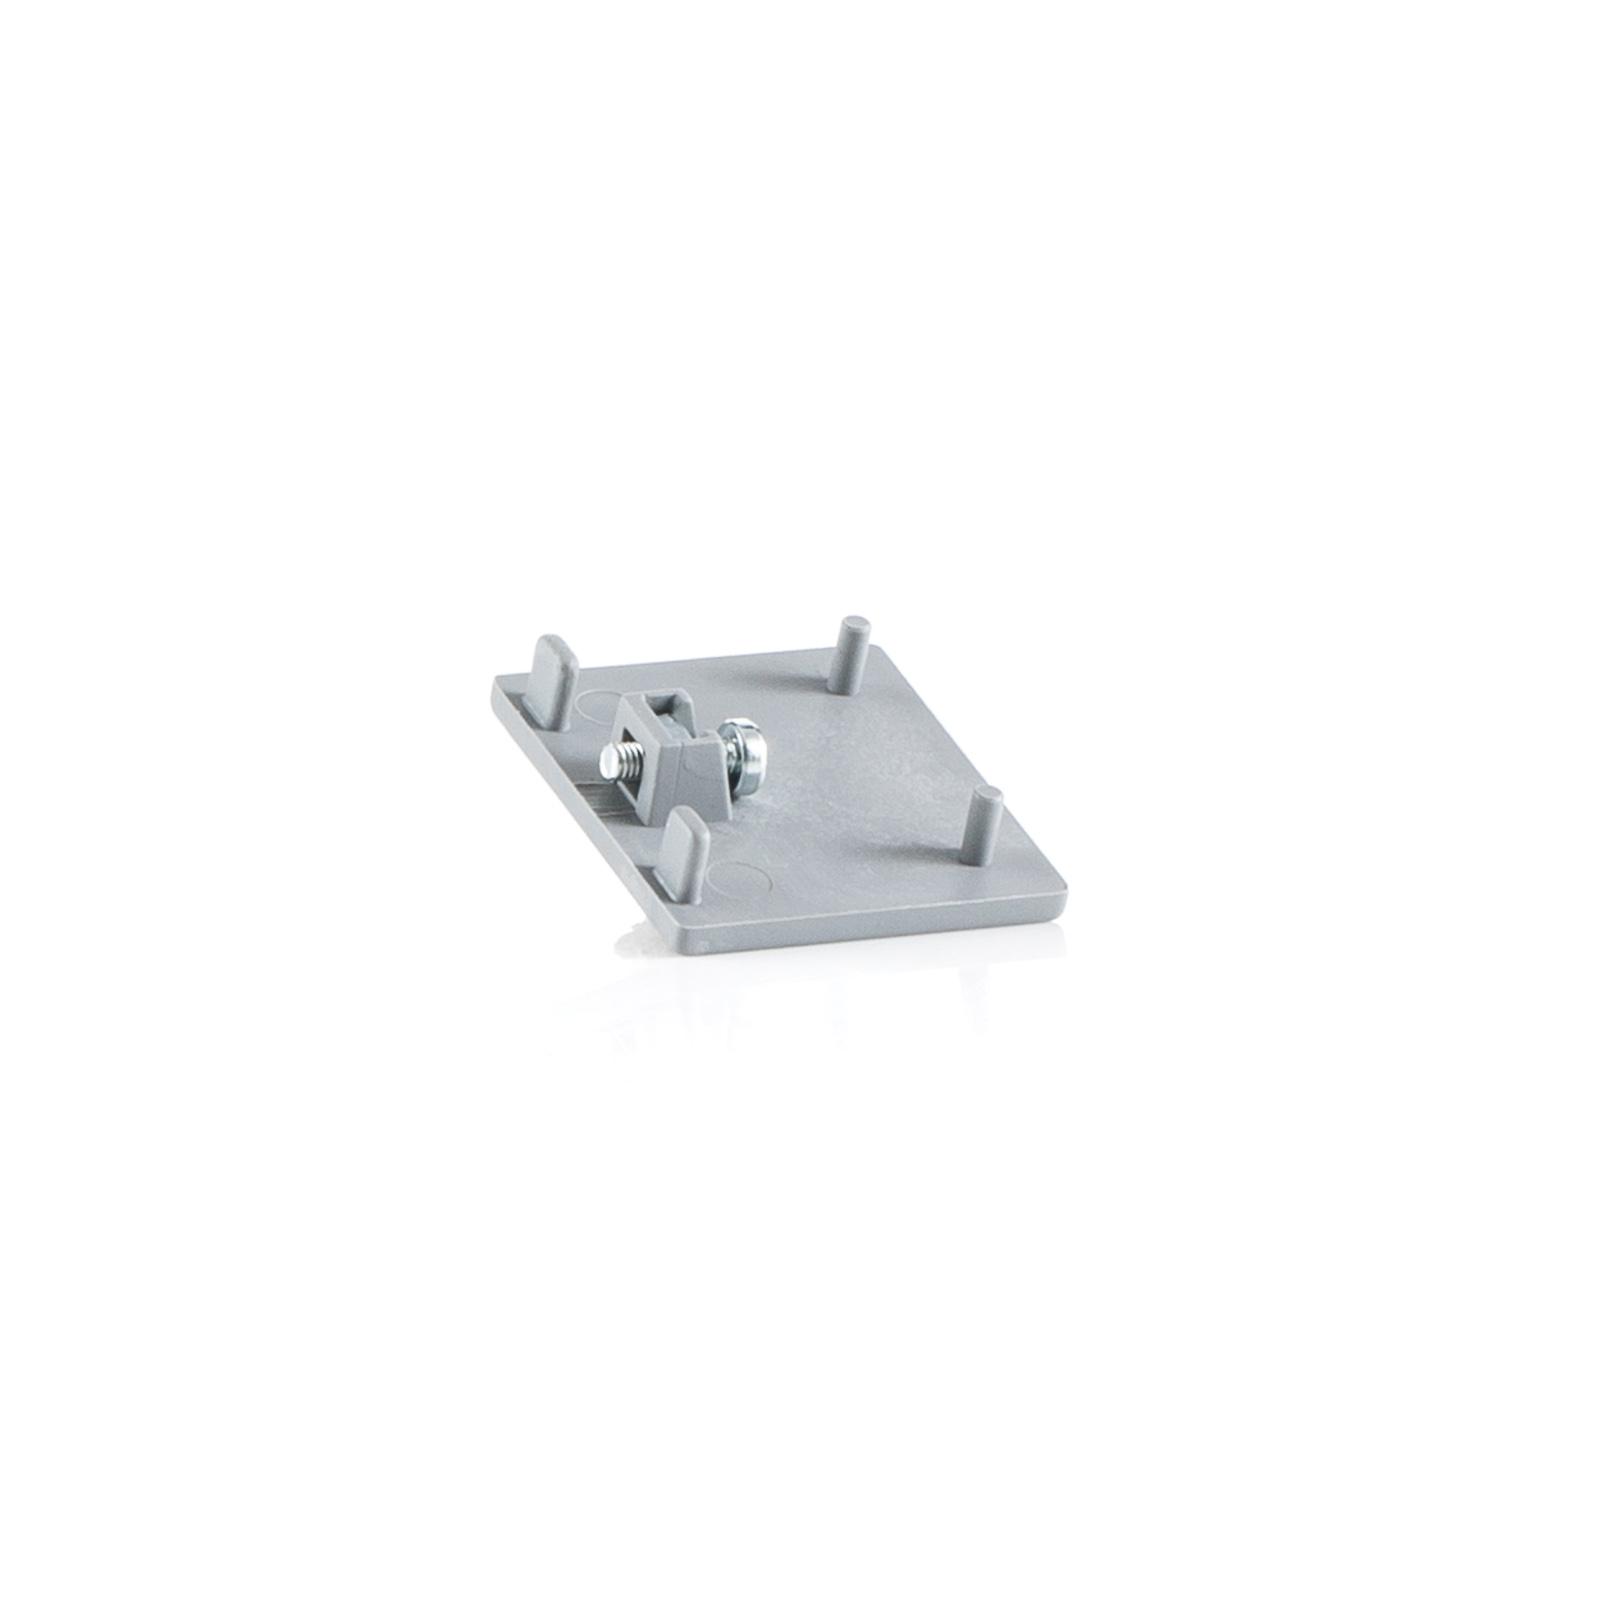 Ivela Endkappe für LKM quadro, silber